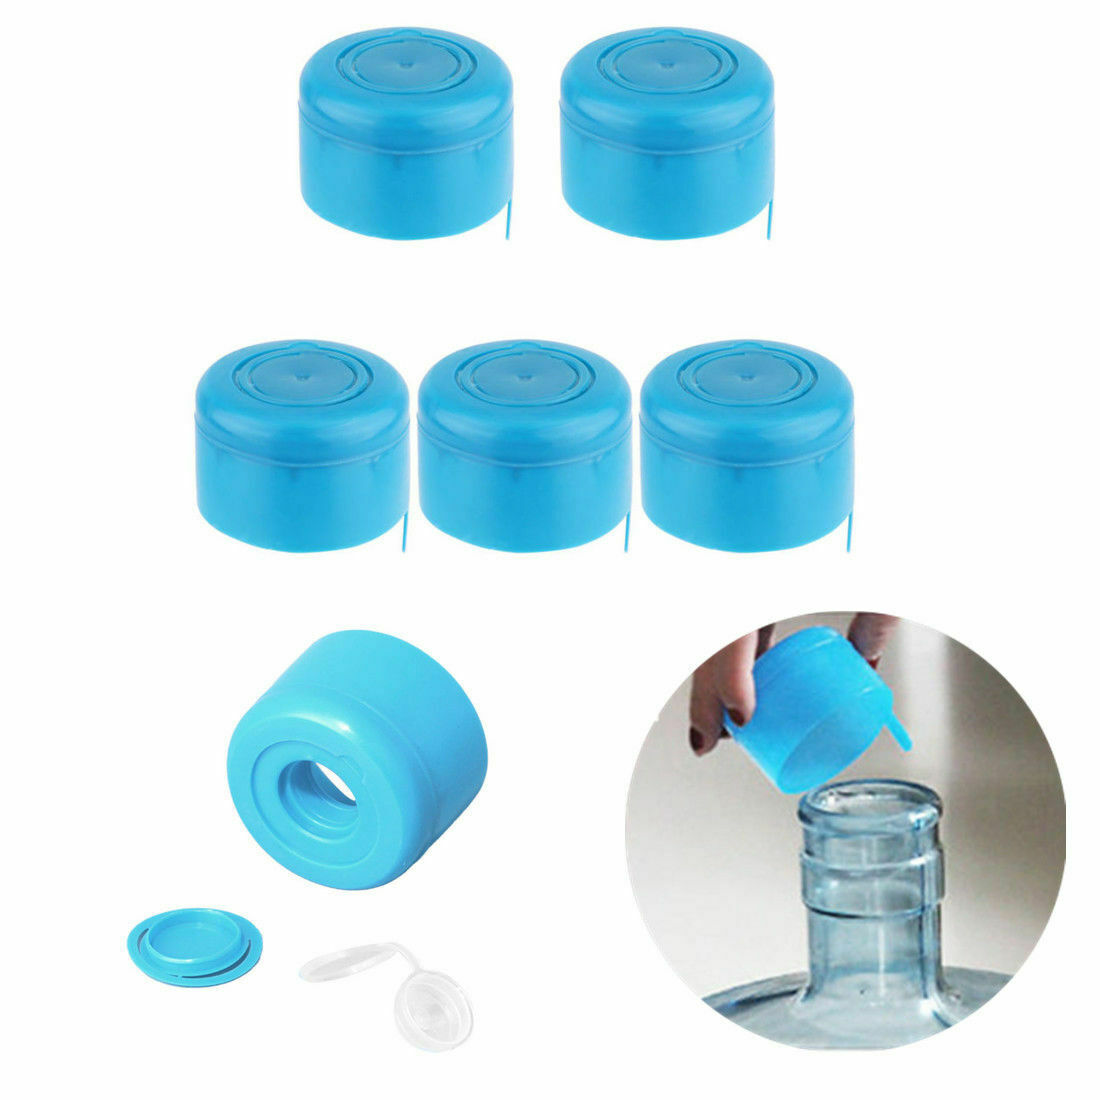 5Pcs Sealing Caps Lids Screw//Press Reusable for Barrel Bottle Water 3-5 Gallon